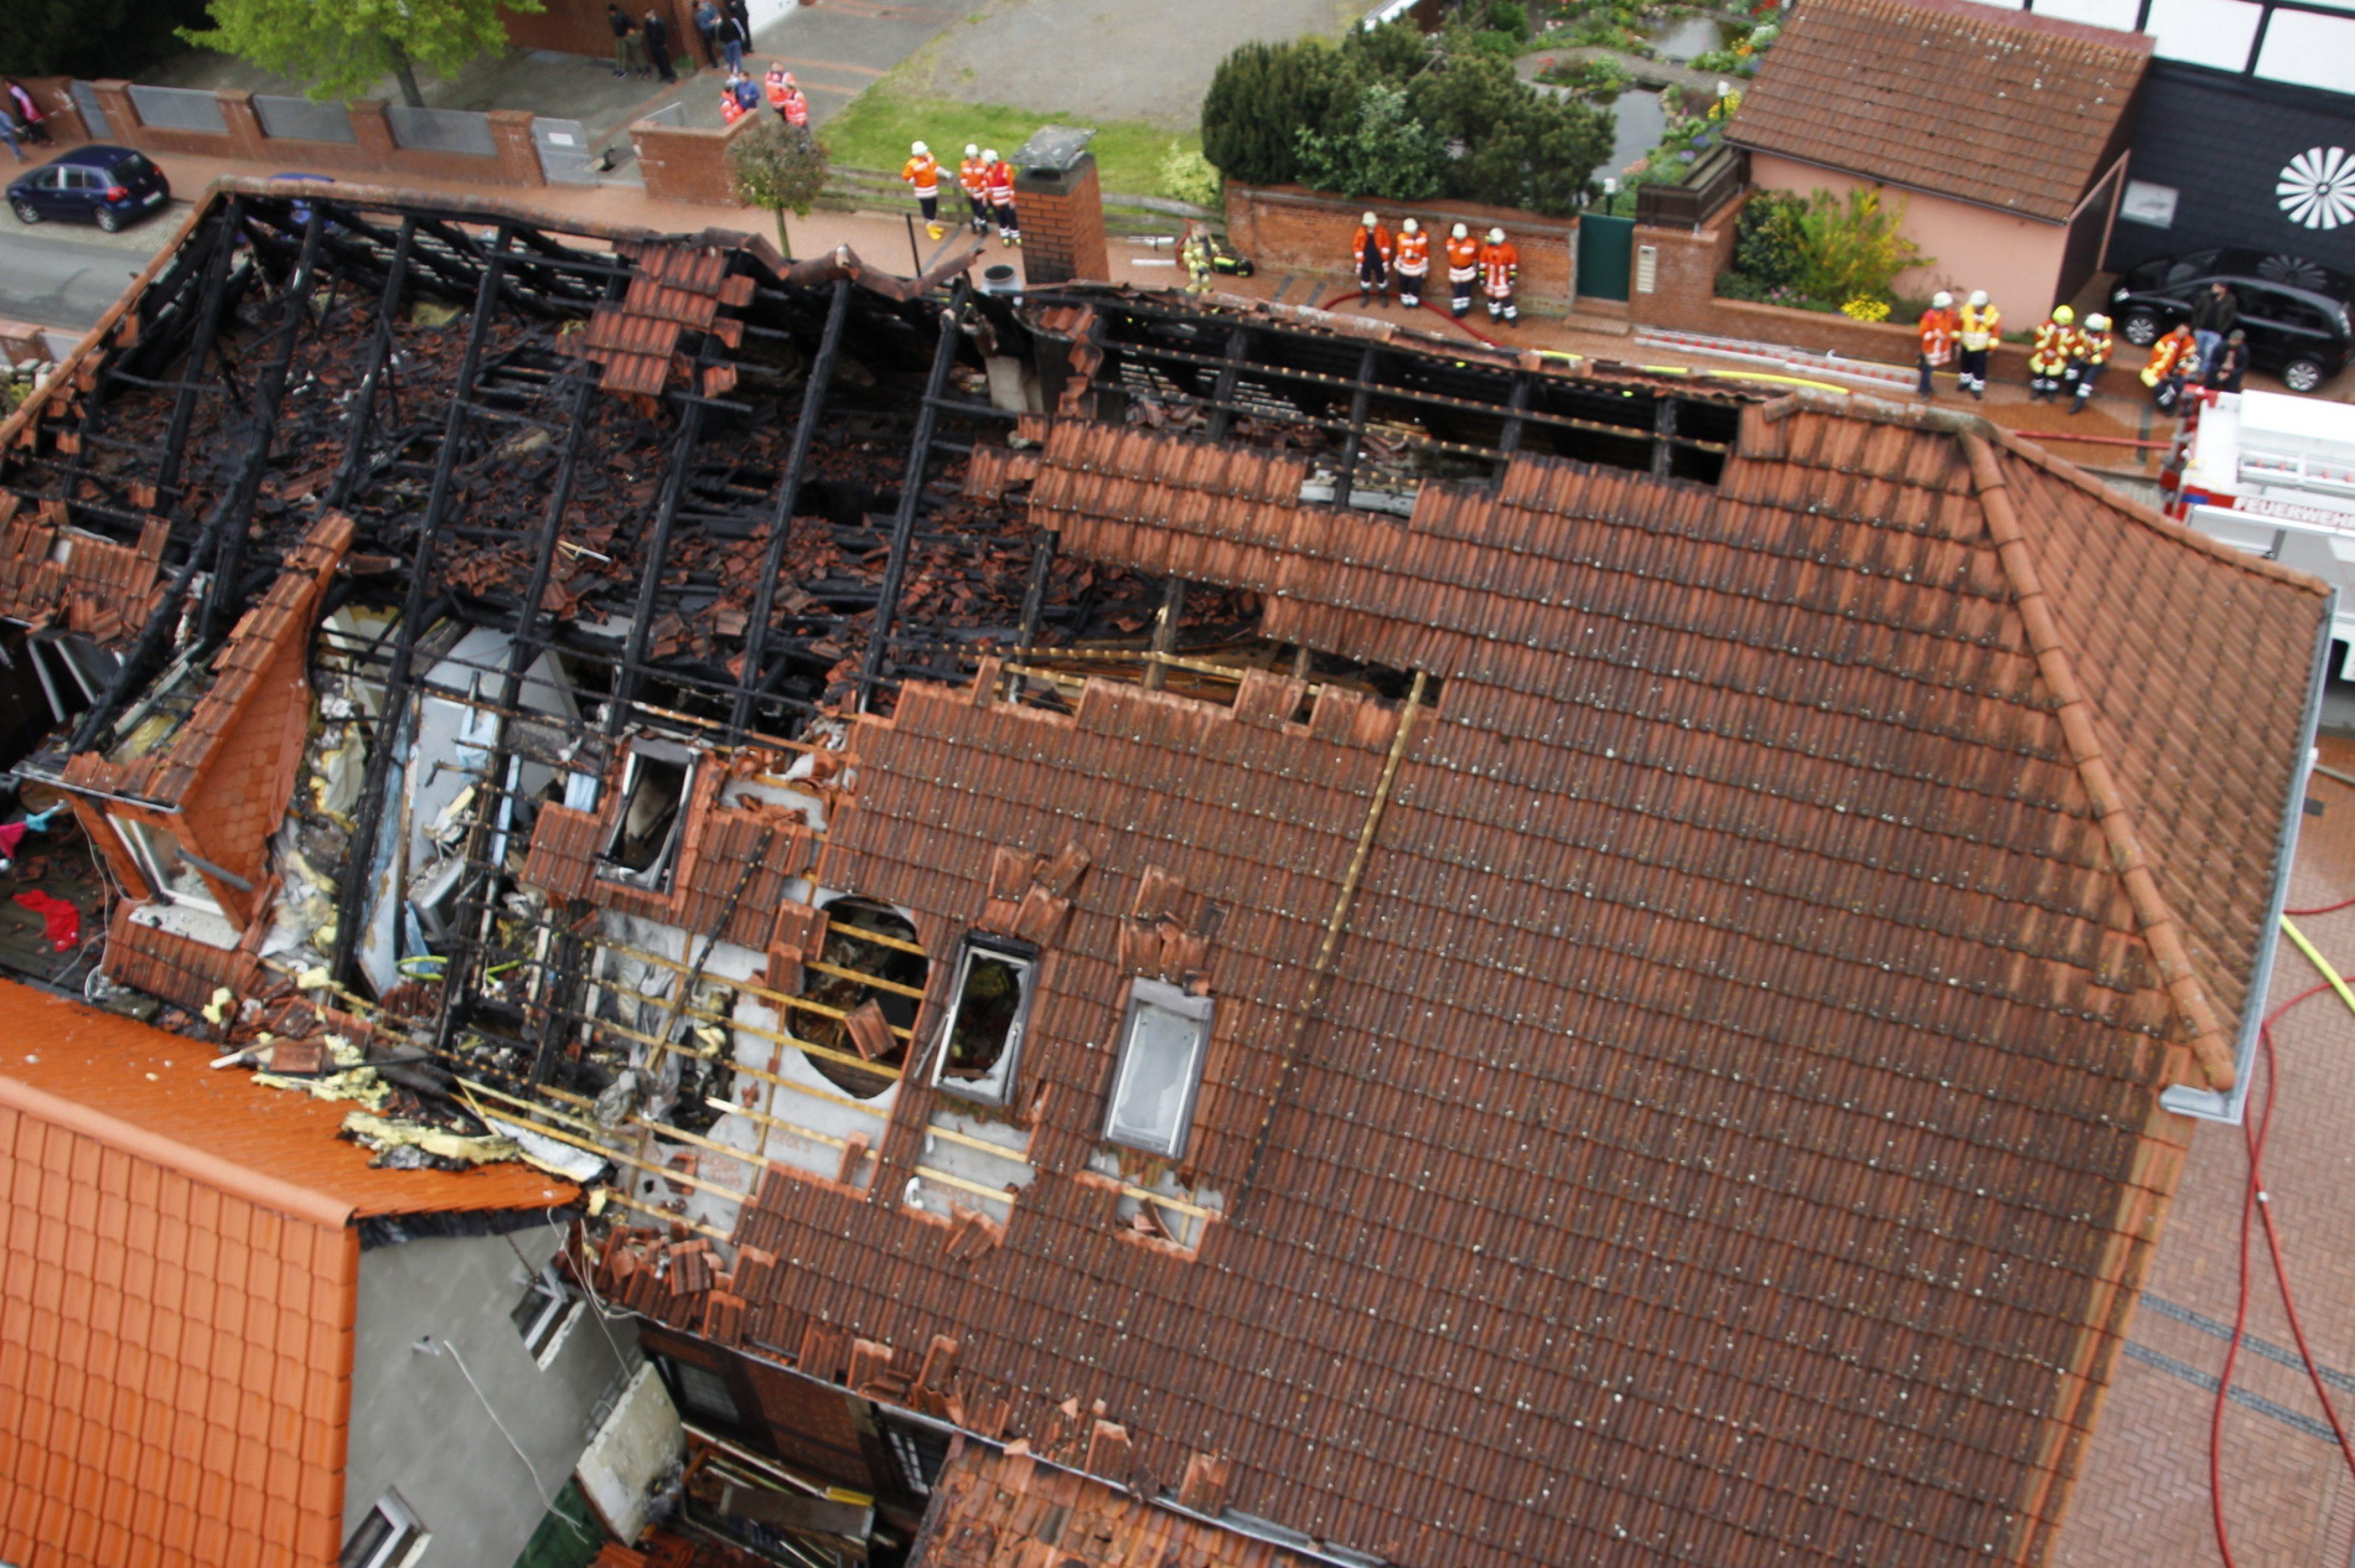 Dachstuhlbrand in Stolzenau